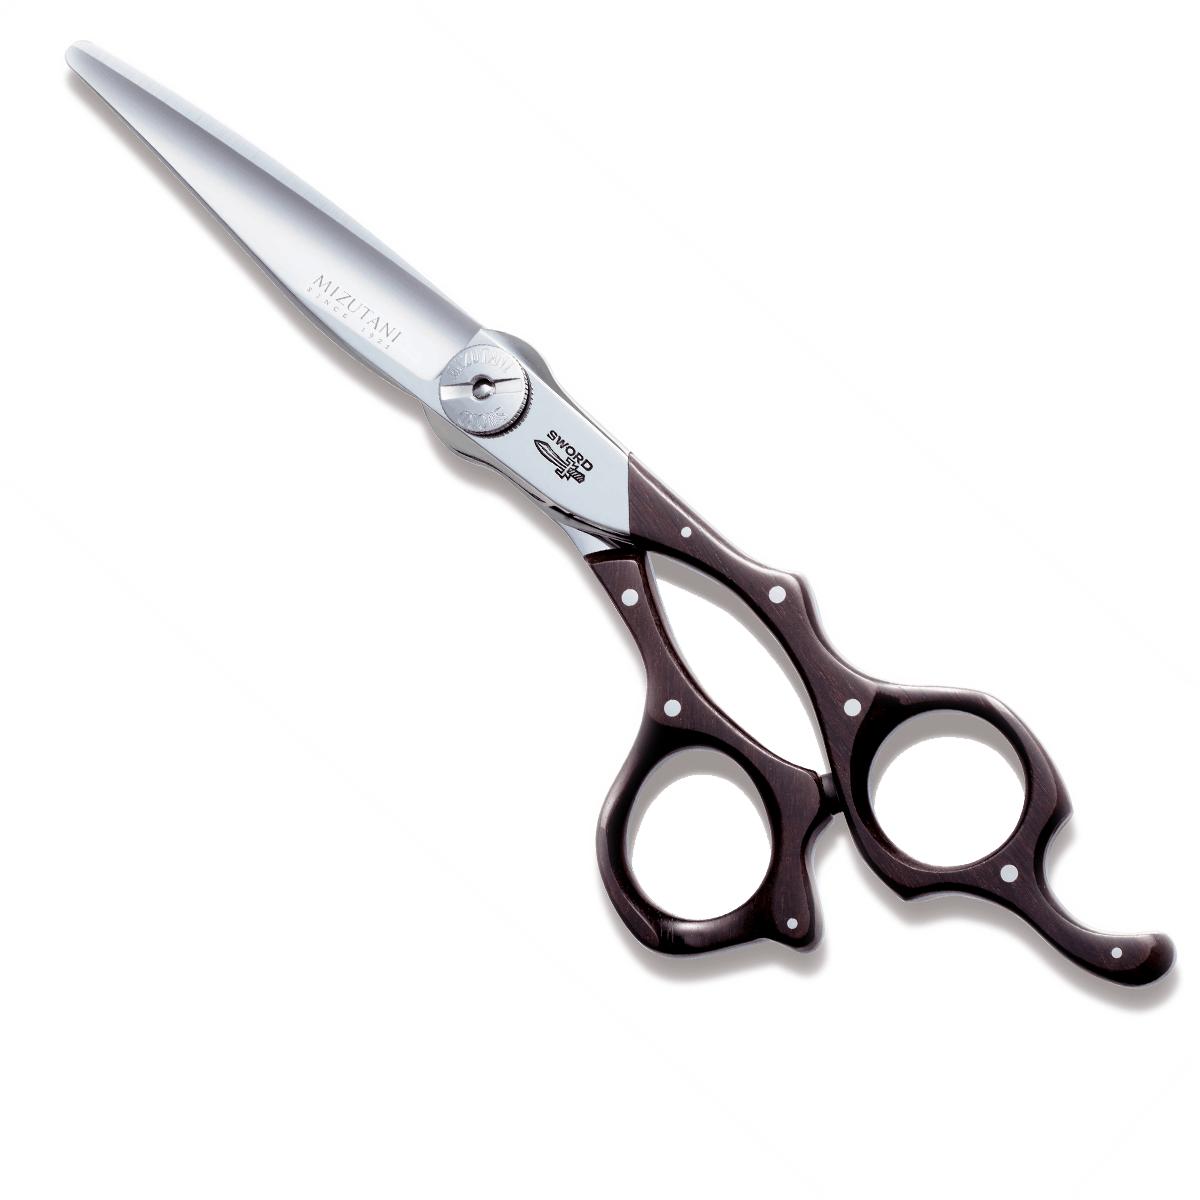 Mizutani SWORD + African Wood D17 Scissors